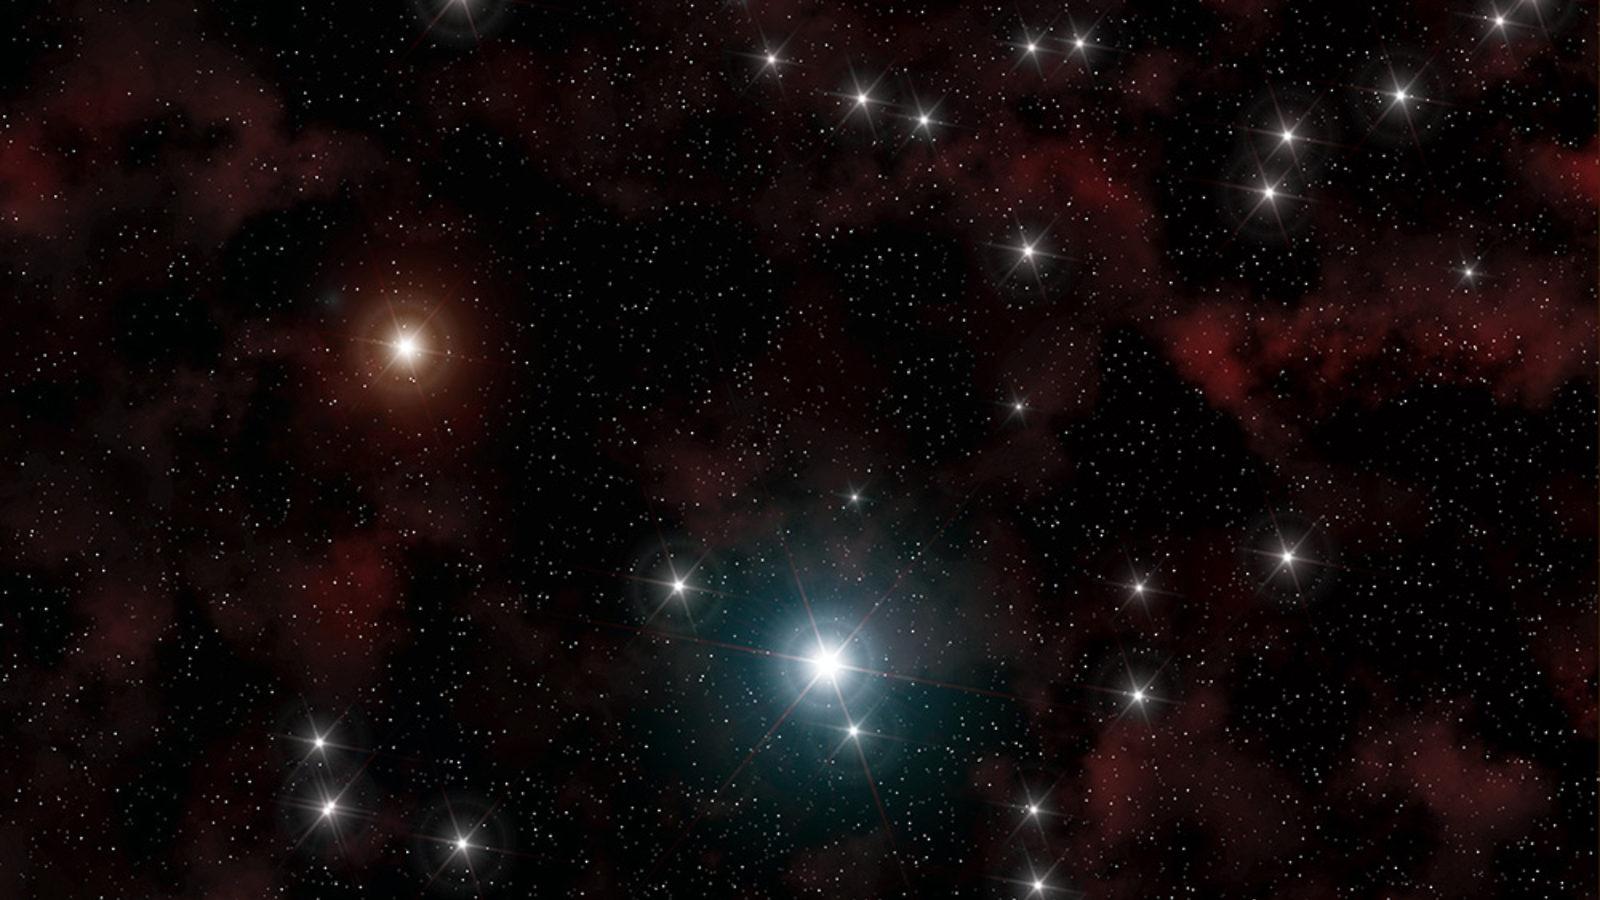 Image: Stars per 100 billion cubic light years